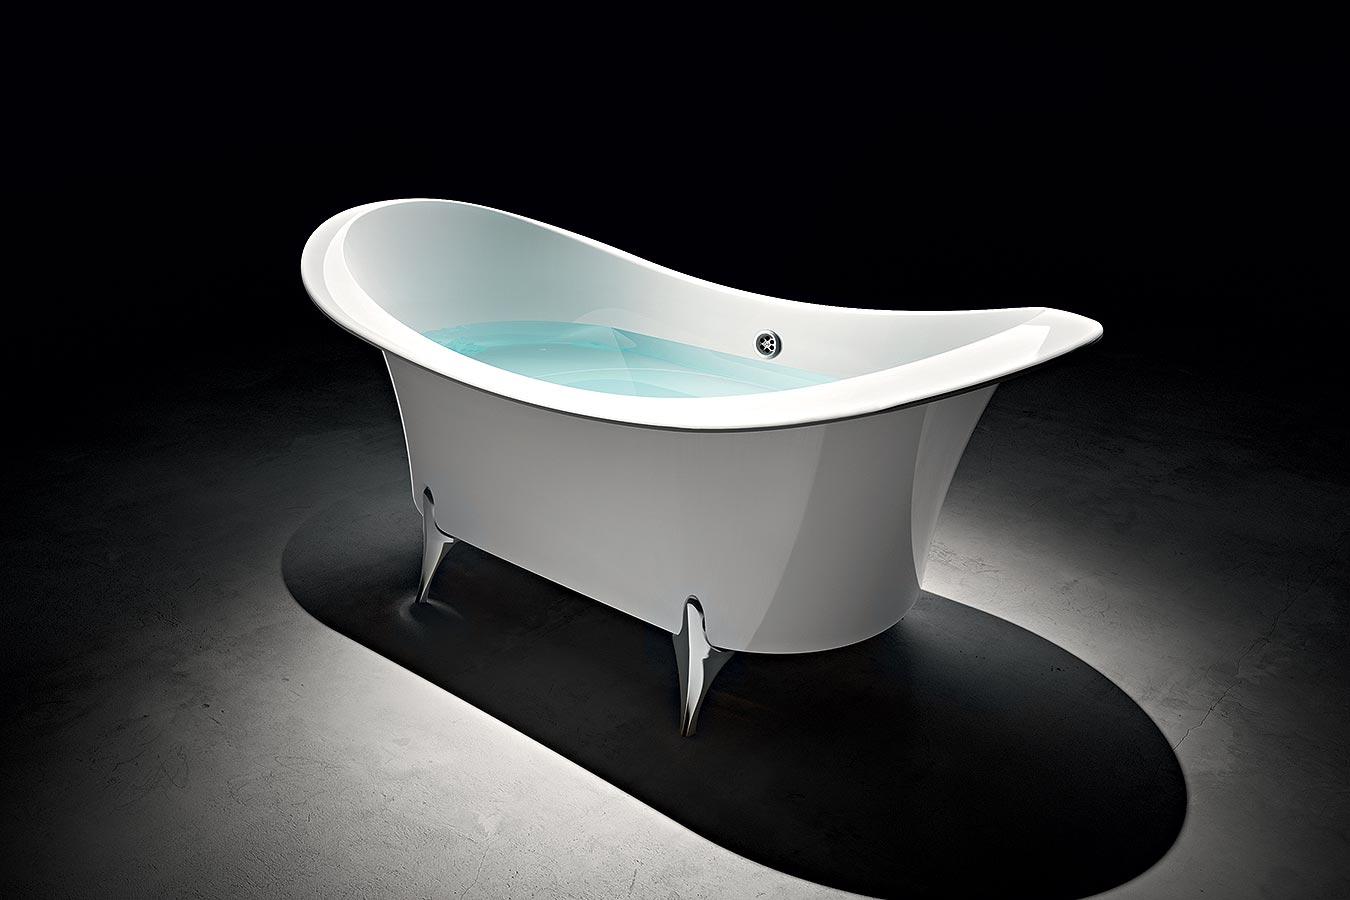 Vasche Da Bagno Angolari Treesse : Treesse vasche hi tech